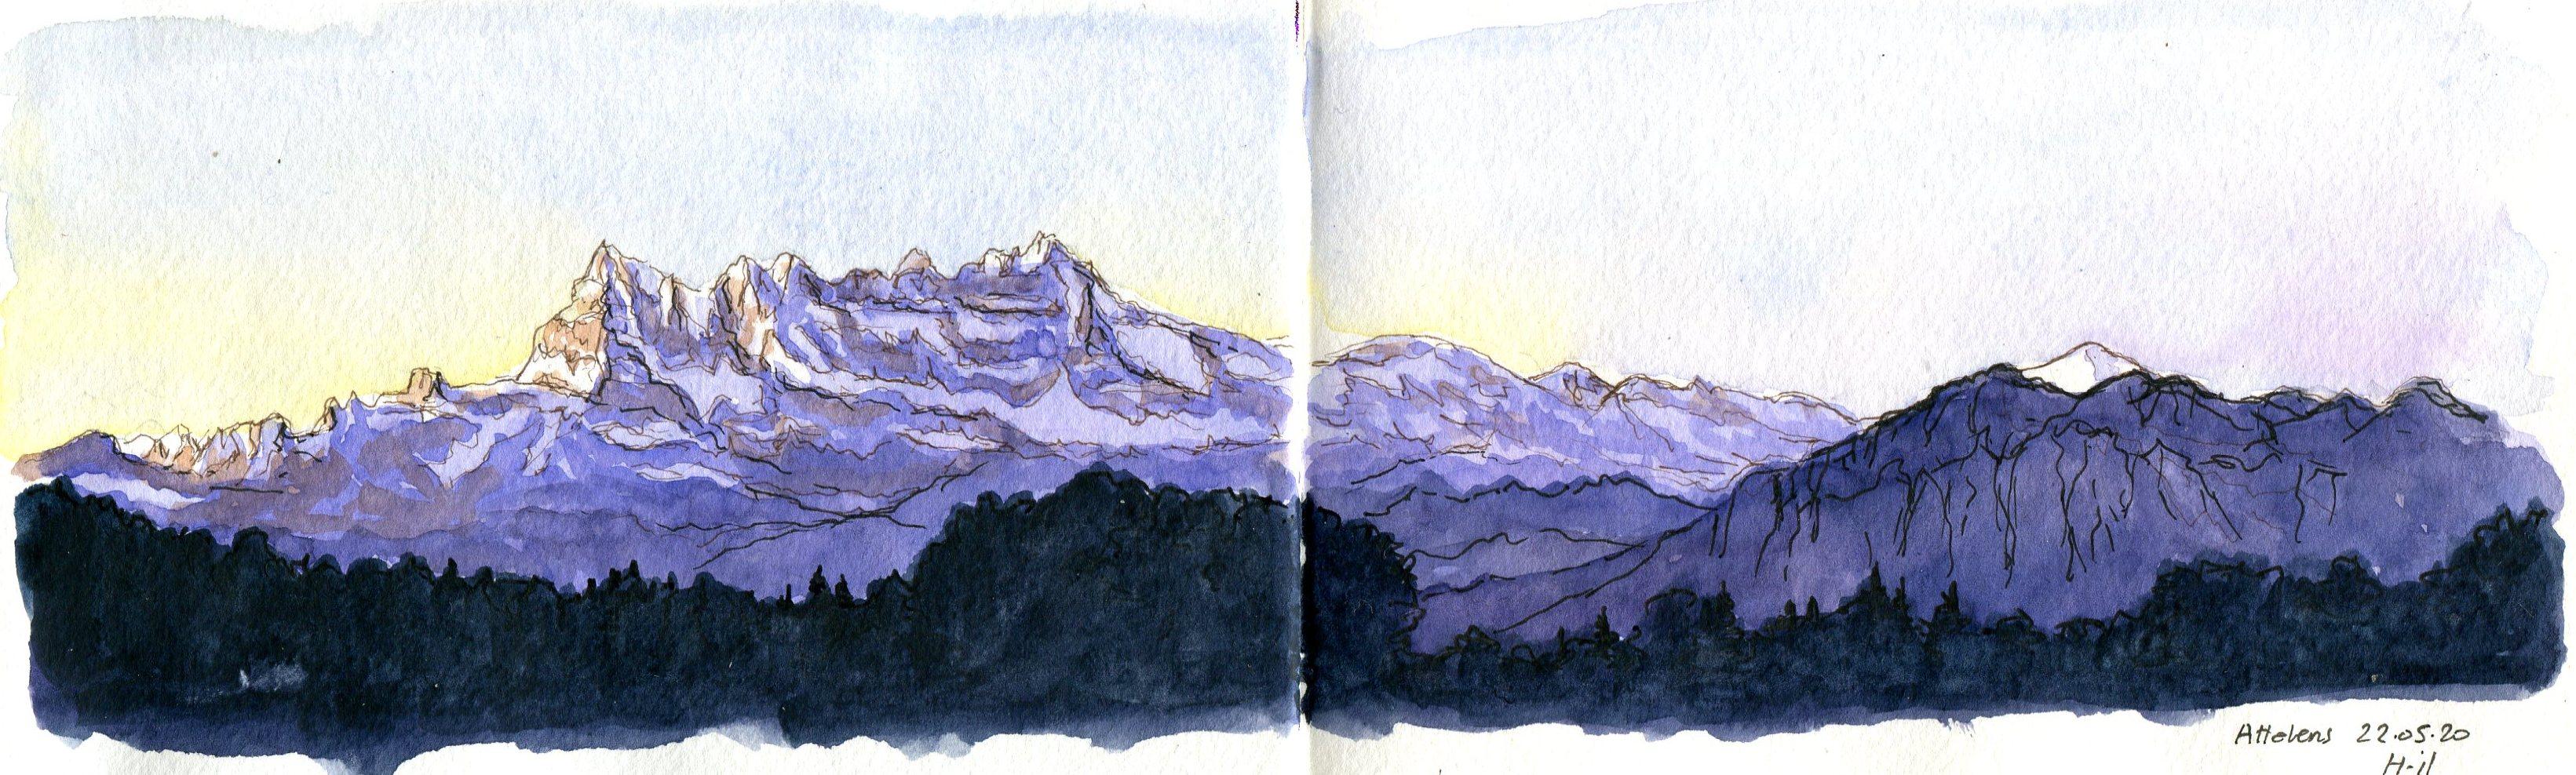 Dents du Midi Mont Blanc080